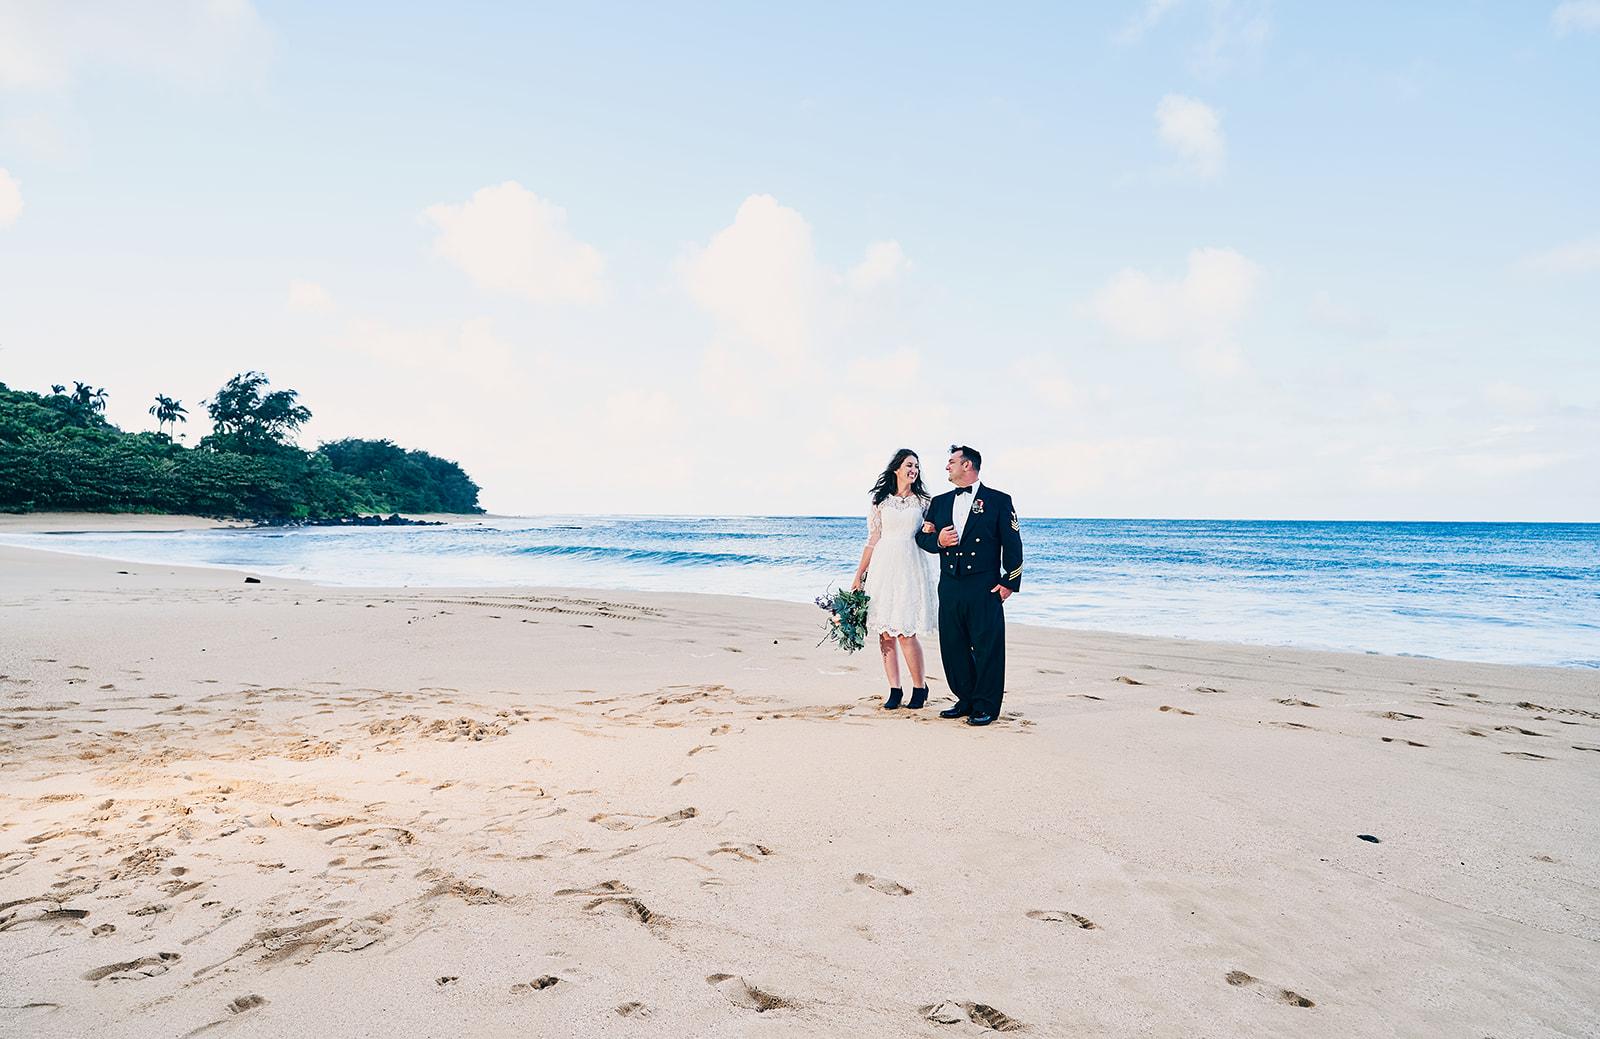 Epic Wedding Photography Beach Location Kauai South Shore